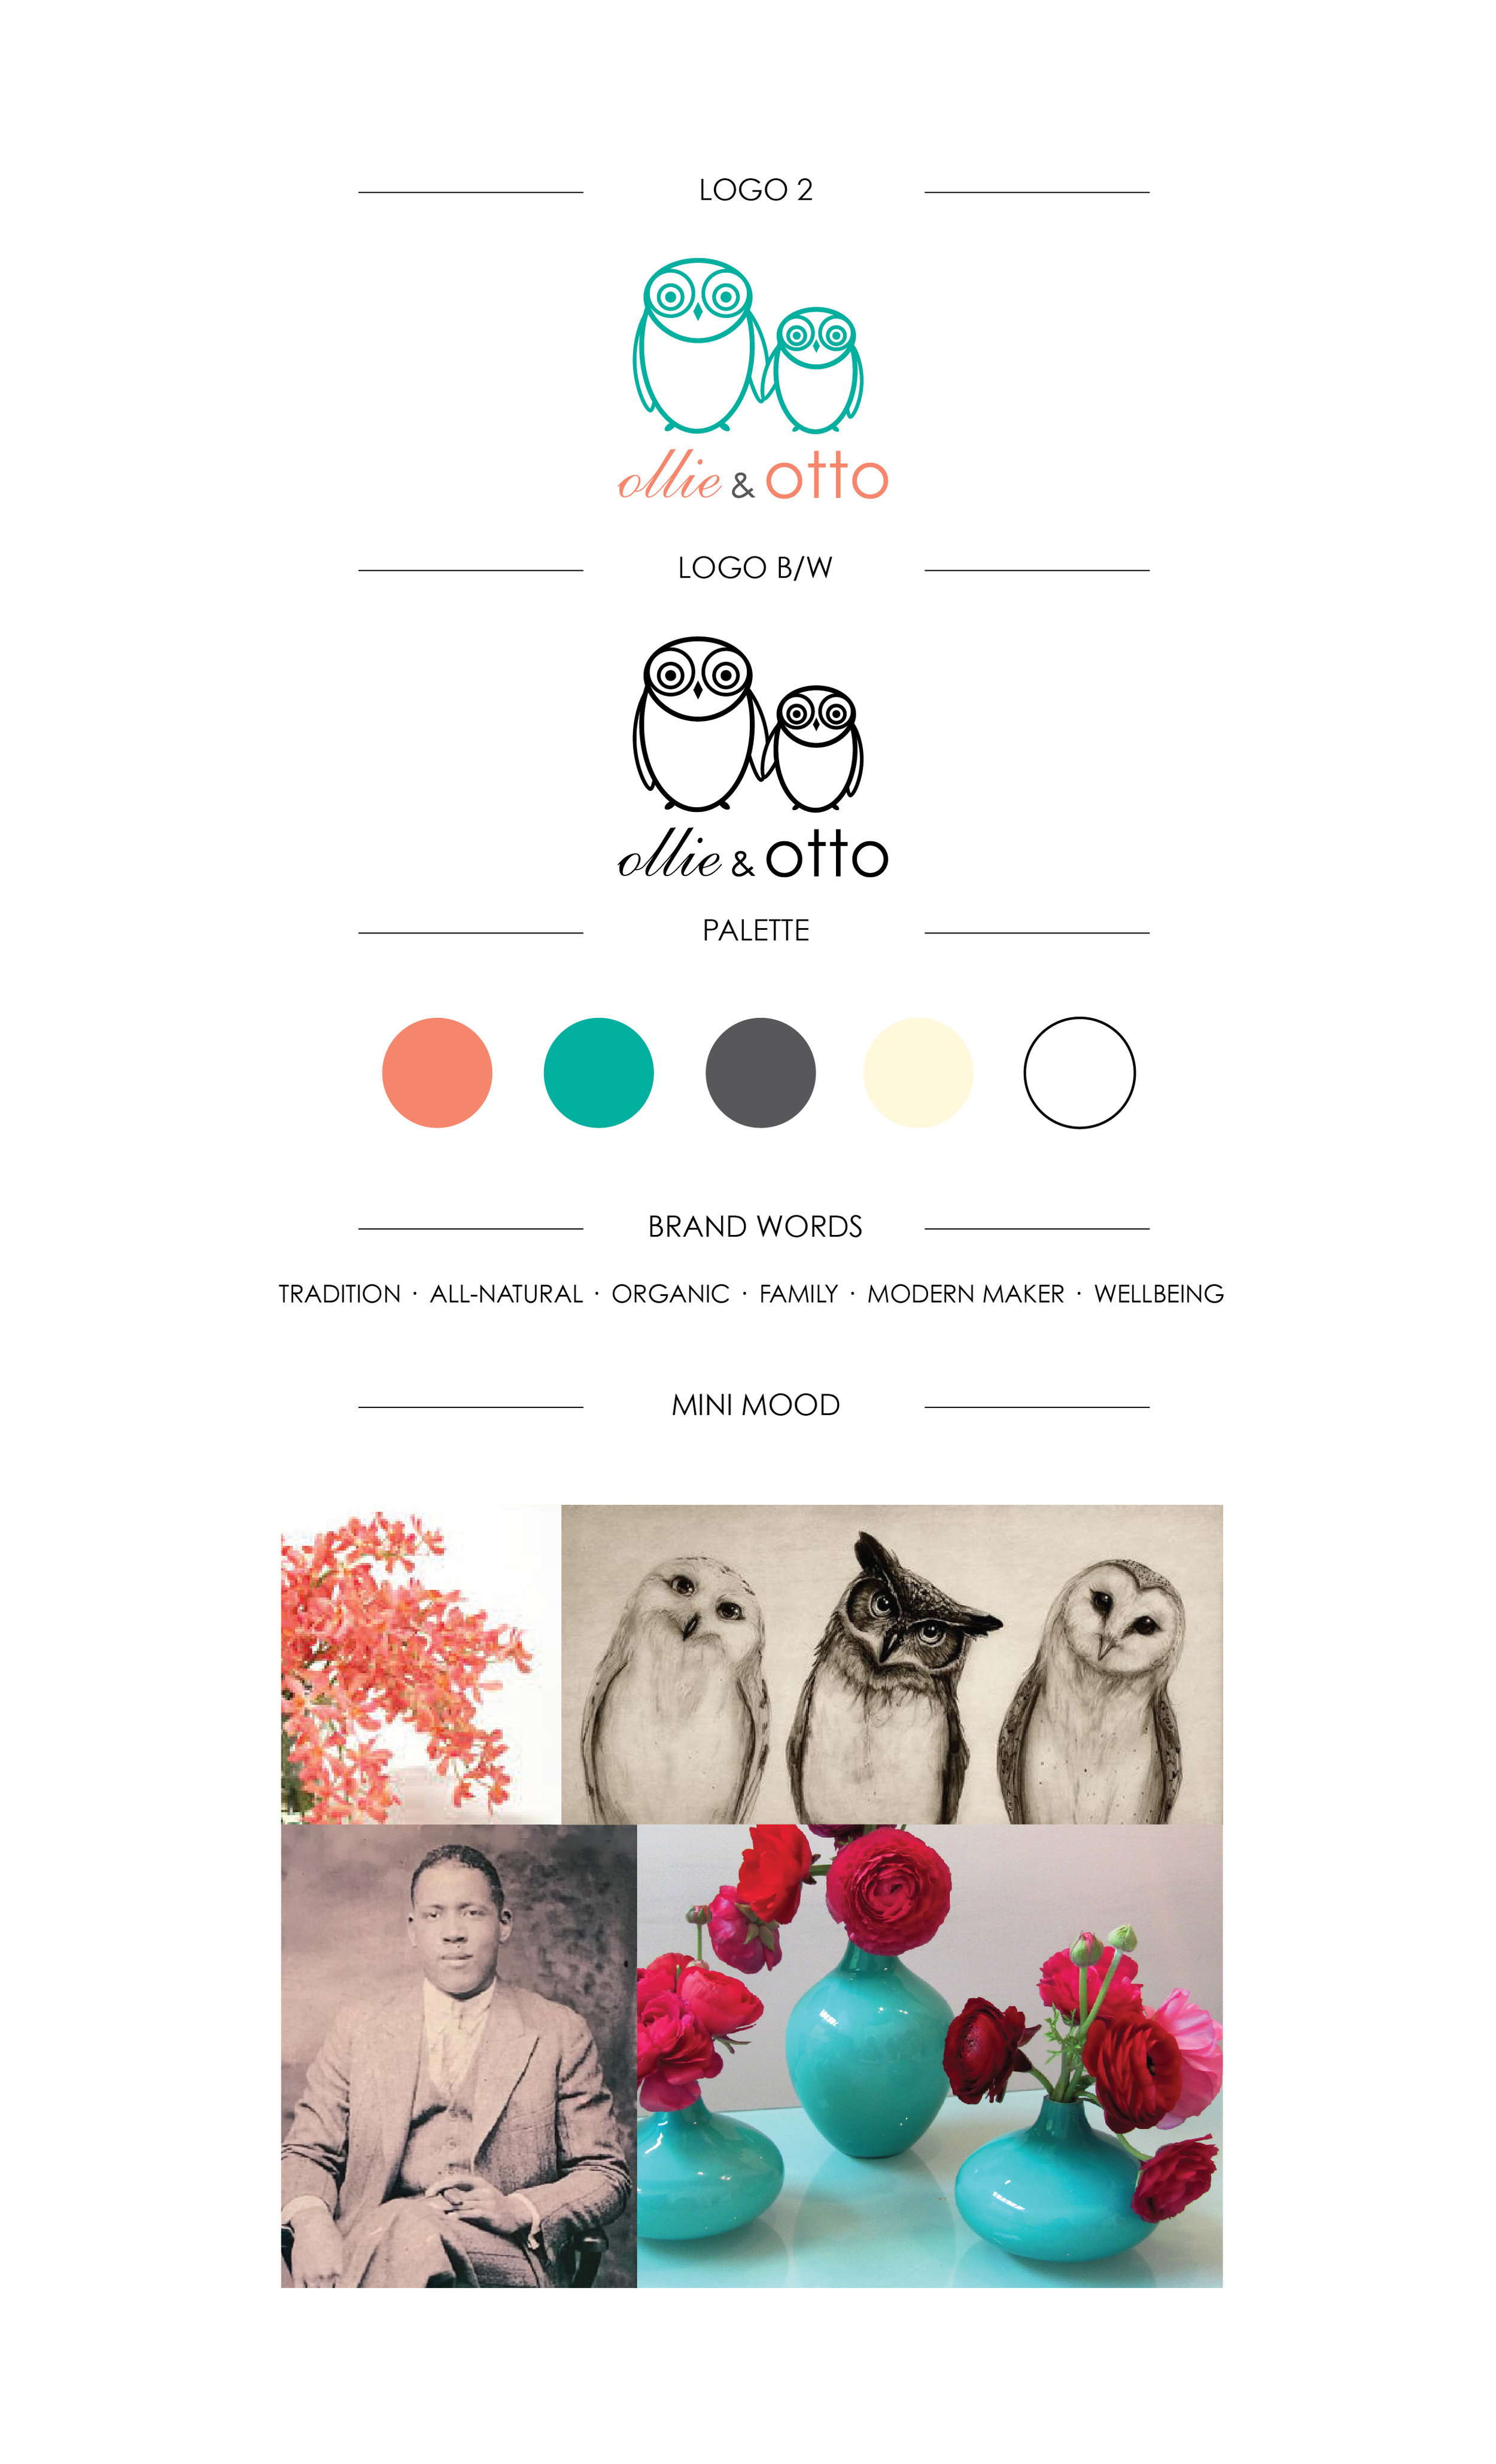 ollieandotto_logo-02.jpg